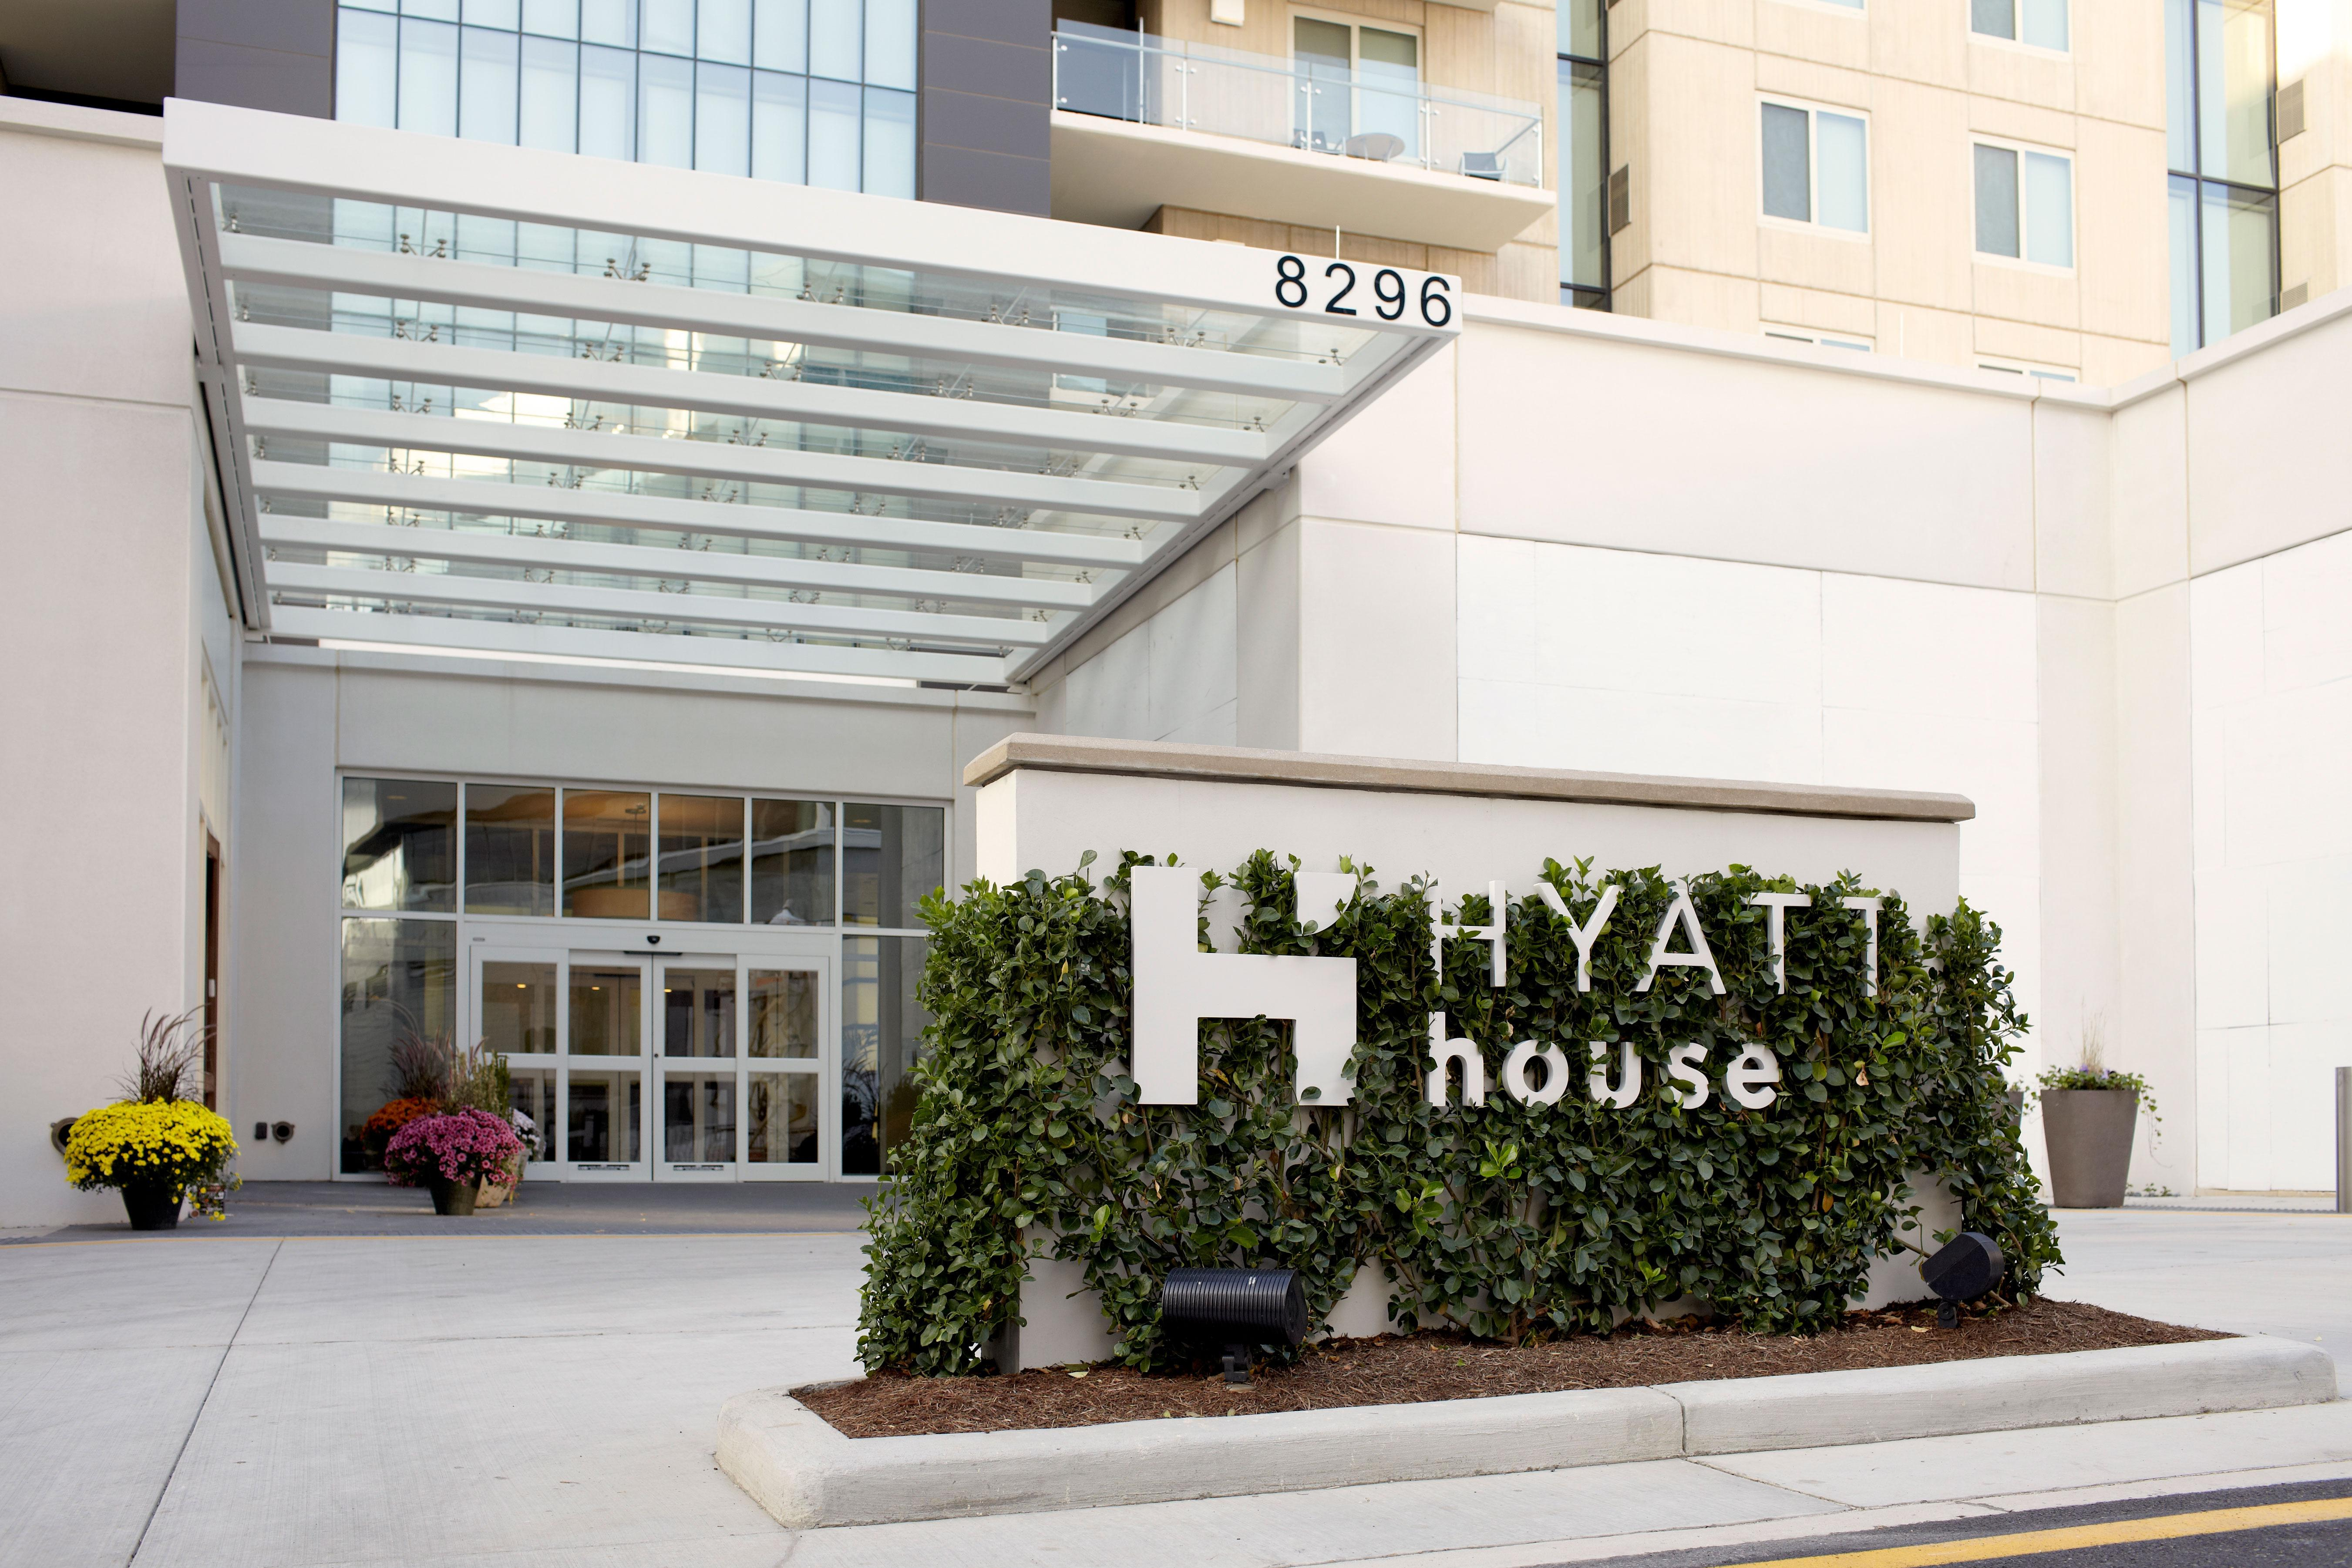 Hyatt House Promo Code Actual Coupons